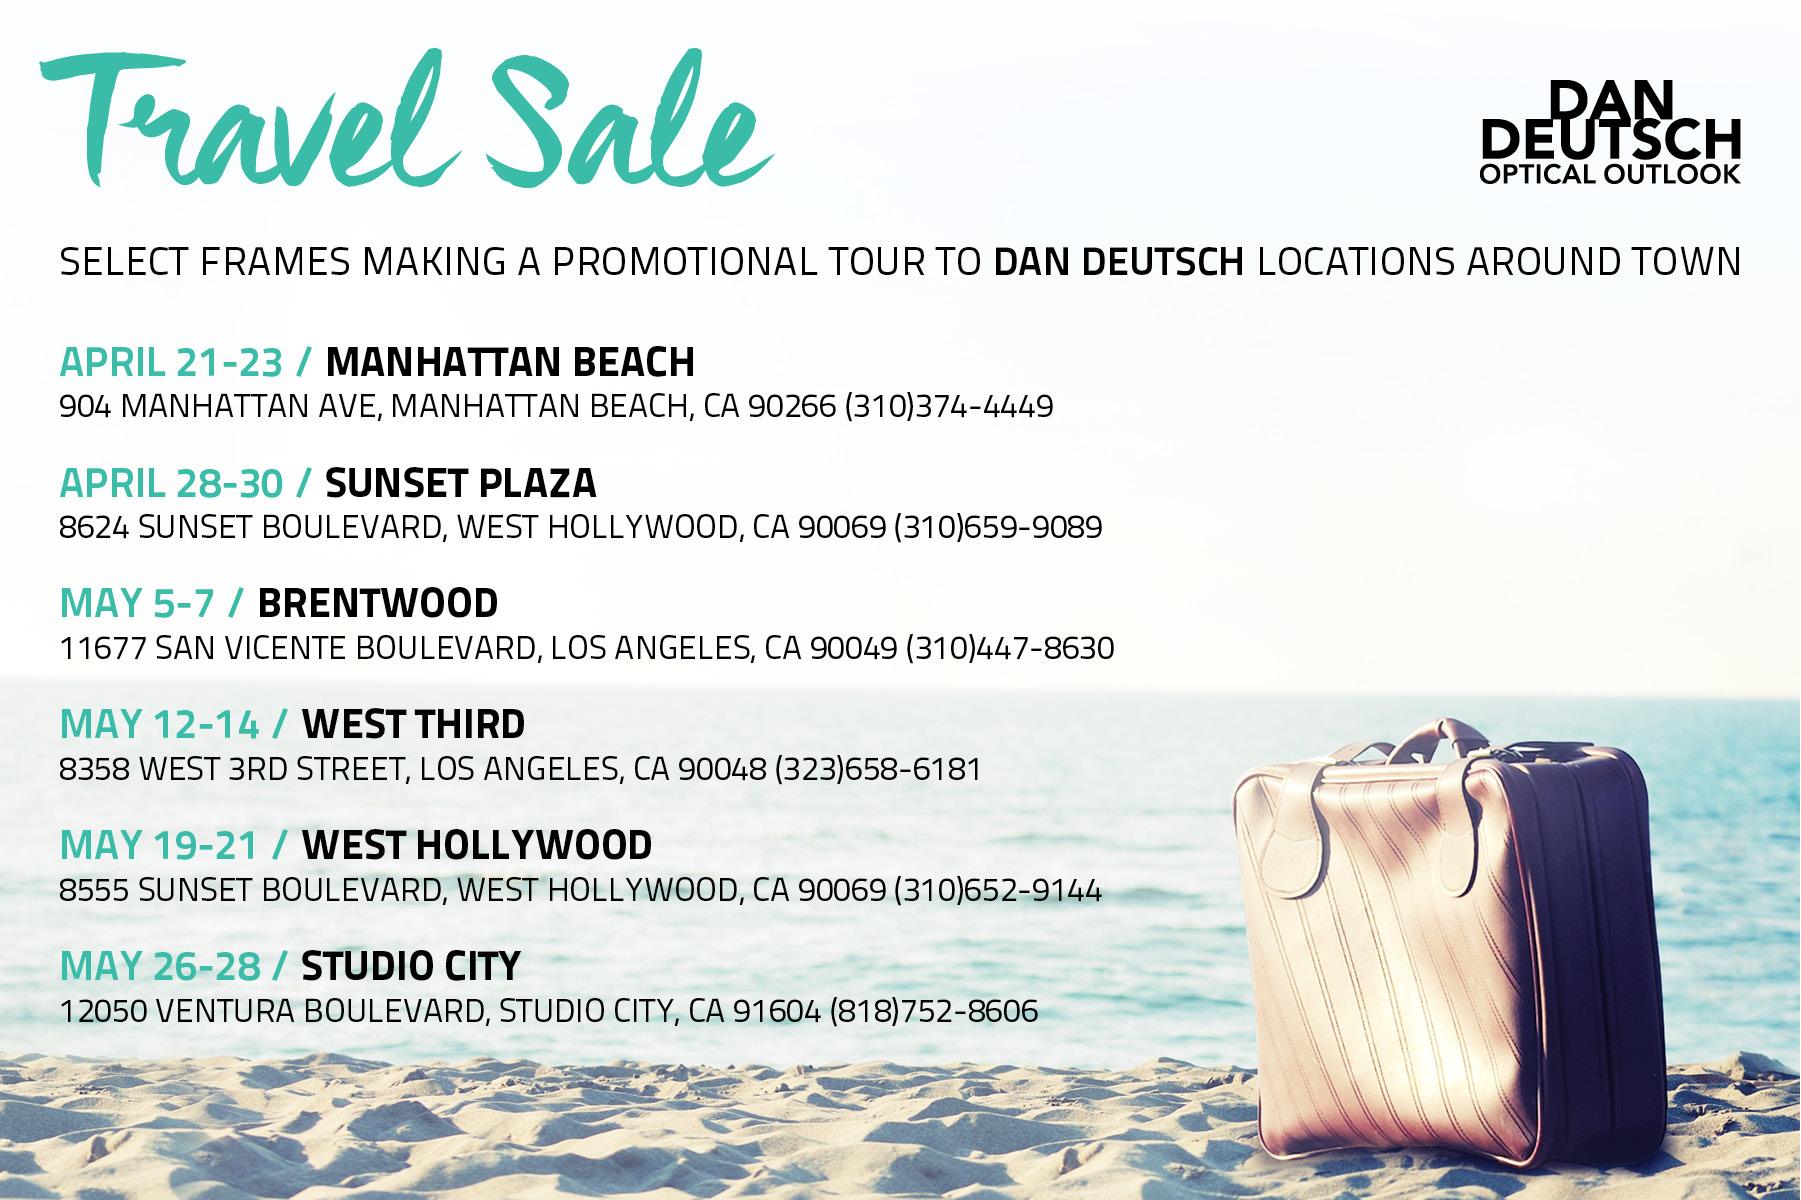 51f0e279844a Dan Deutsch Optical Outlook - Los Angeles Eyewear